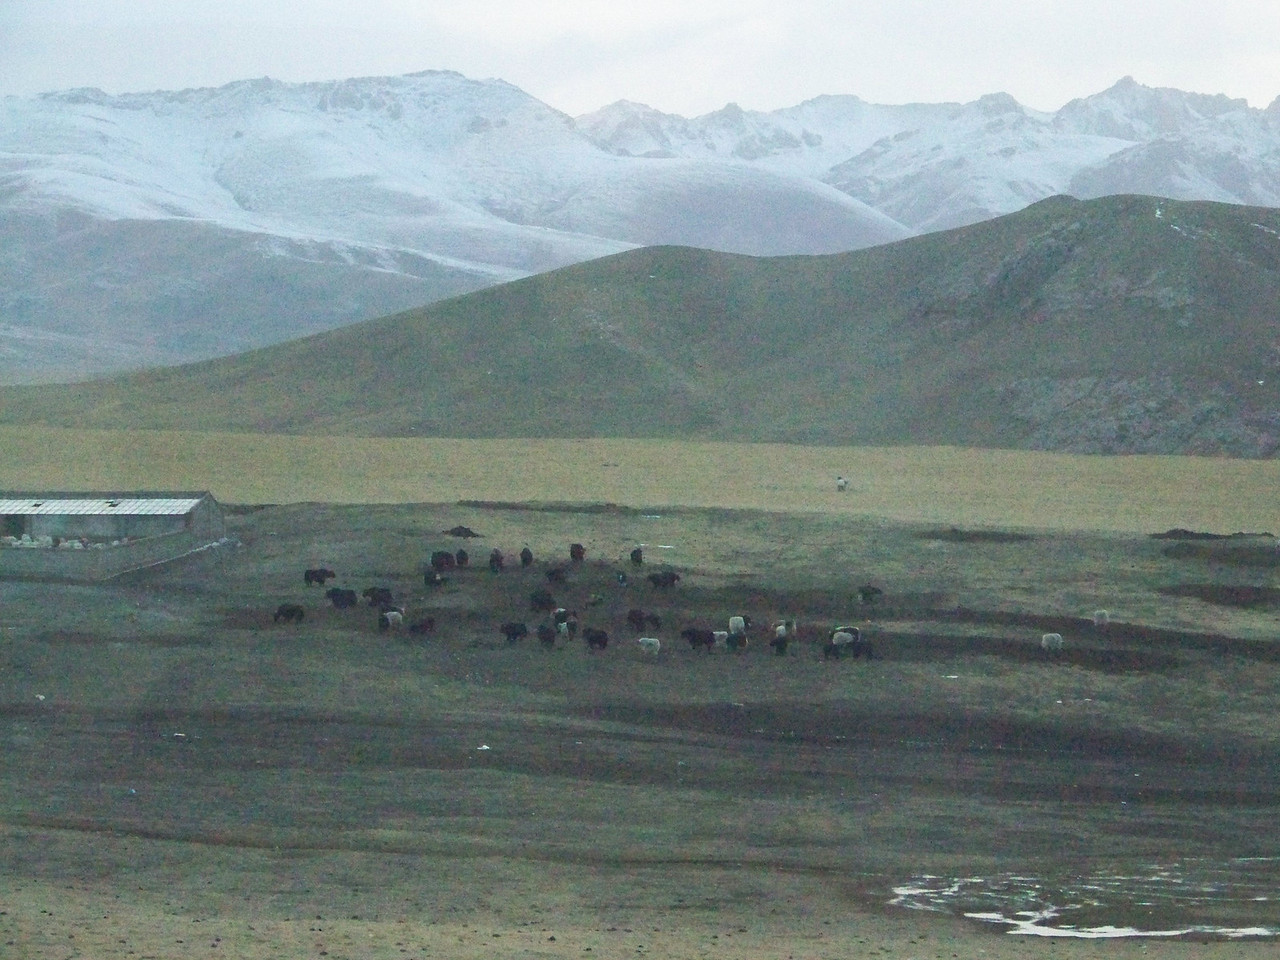 0095 - Yaks on Train Trip Between Beijing and Lhasa.JPG